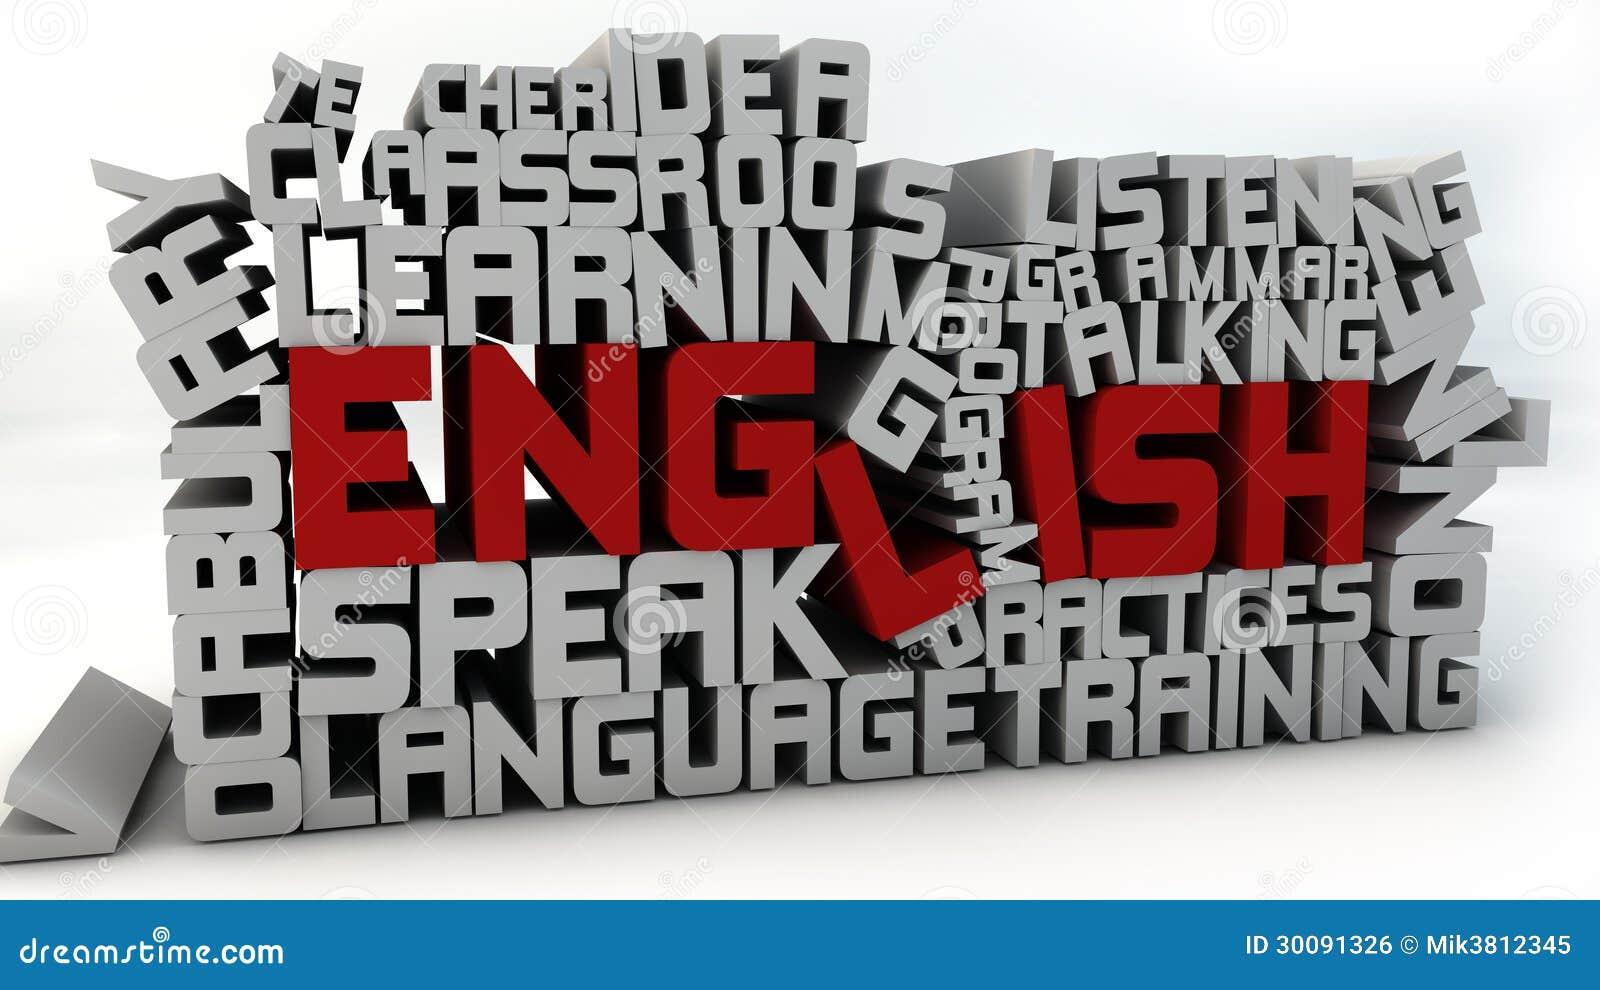 English esl study design